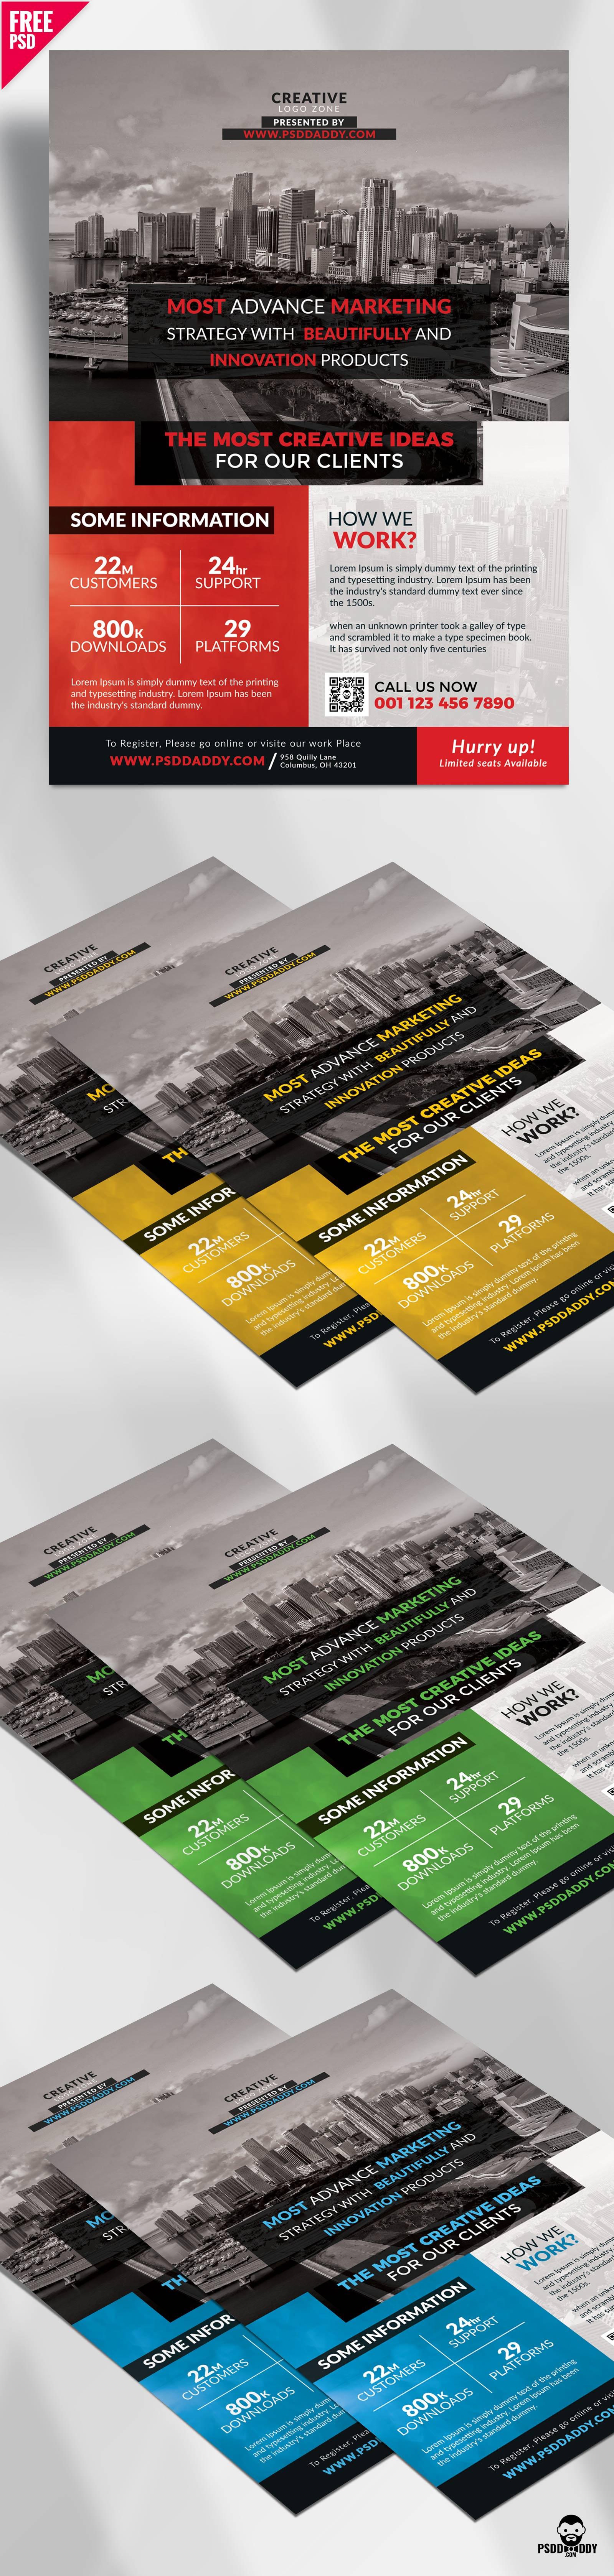 1000 flyers, a5 flyer, a5 leaflets, advertisement template psd, advertising flyers, brochure design psd, brochure templates psd, business advertising flyers, business cards and flyers, business cards flyers, business flyer design, business flyer templates free, business flyers, cheap business flyers, club flyer templates, cost of flyers, custom flyers, elegant flyer, event flyer templates, event flyers free, flyer creator, flyer design, flyer design online, flyer design psd, flyer design templates, flyer free, flyer free download, flyer maker, flyer online, flyer party, flyer party psd, flyer photoshop, flyer printing, flyer psd, flyer psd free, flyer template psd, flyer templates, flyer templates free download, flyers, flyers online, flyers online free, free club flyer psd, free club flyer templates, free event flyer templates, free flyer, free flyer design, free flyer design templates, free flyer maker, free flyer templates, free party flyer templates, free photoshop templates, free poster templates, free psd, free psd flyer, free psd flyer templates, free psd templates, leaflet maker, leaflet printing, marketing flyers, online flyer maker, party flyer, party flyer psd, party flyer templates, party psd, poster psd, professional flyers, promotional flyers, psd flyer, psd flyer free, psd free, psd free download, psd templates, psd templates free download, small business flyers, template psd, psd, mockup psd, psd daddy, daddy psd, freebie, psdfreebies, psd freebies, graphics, download psd,